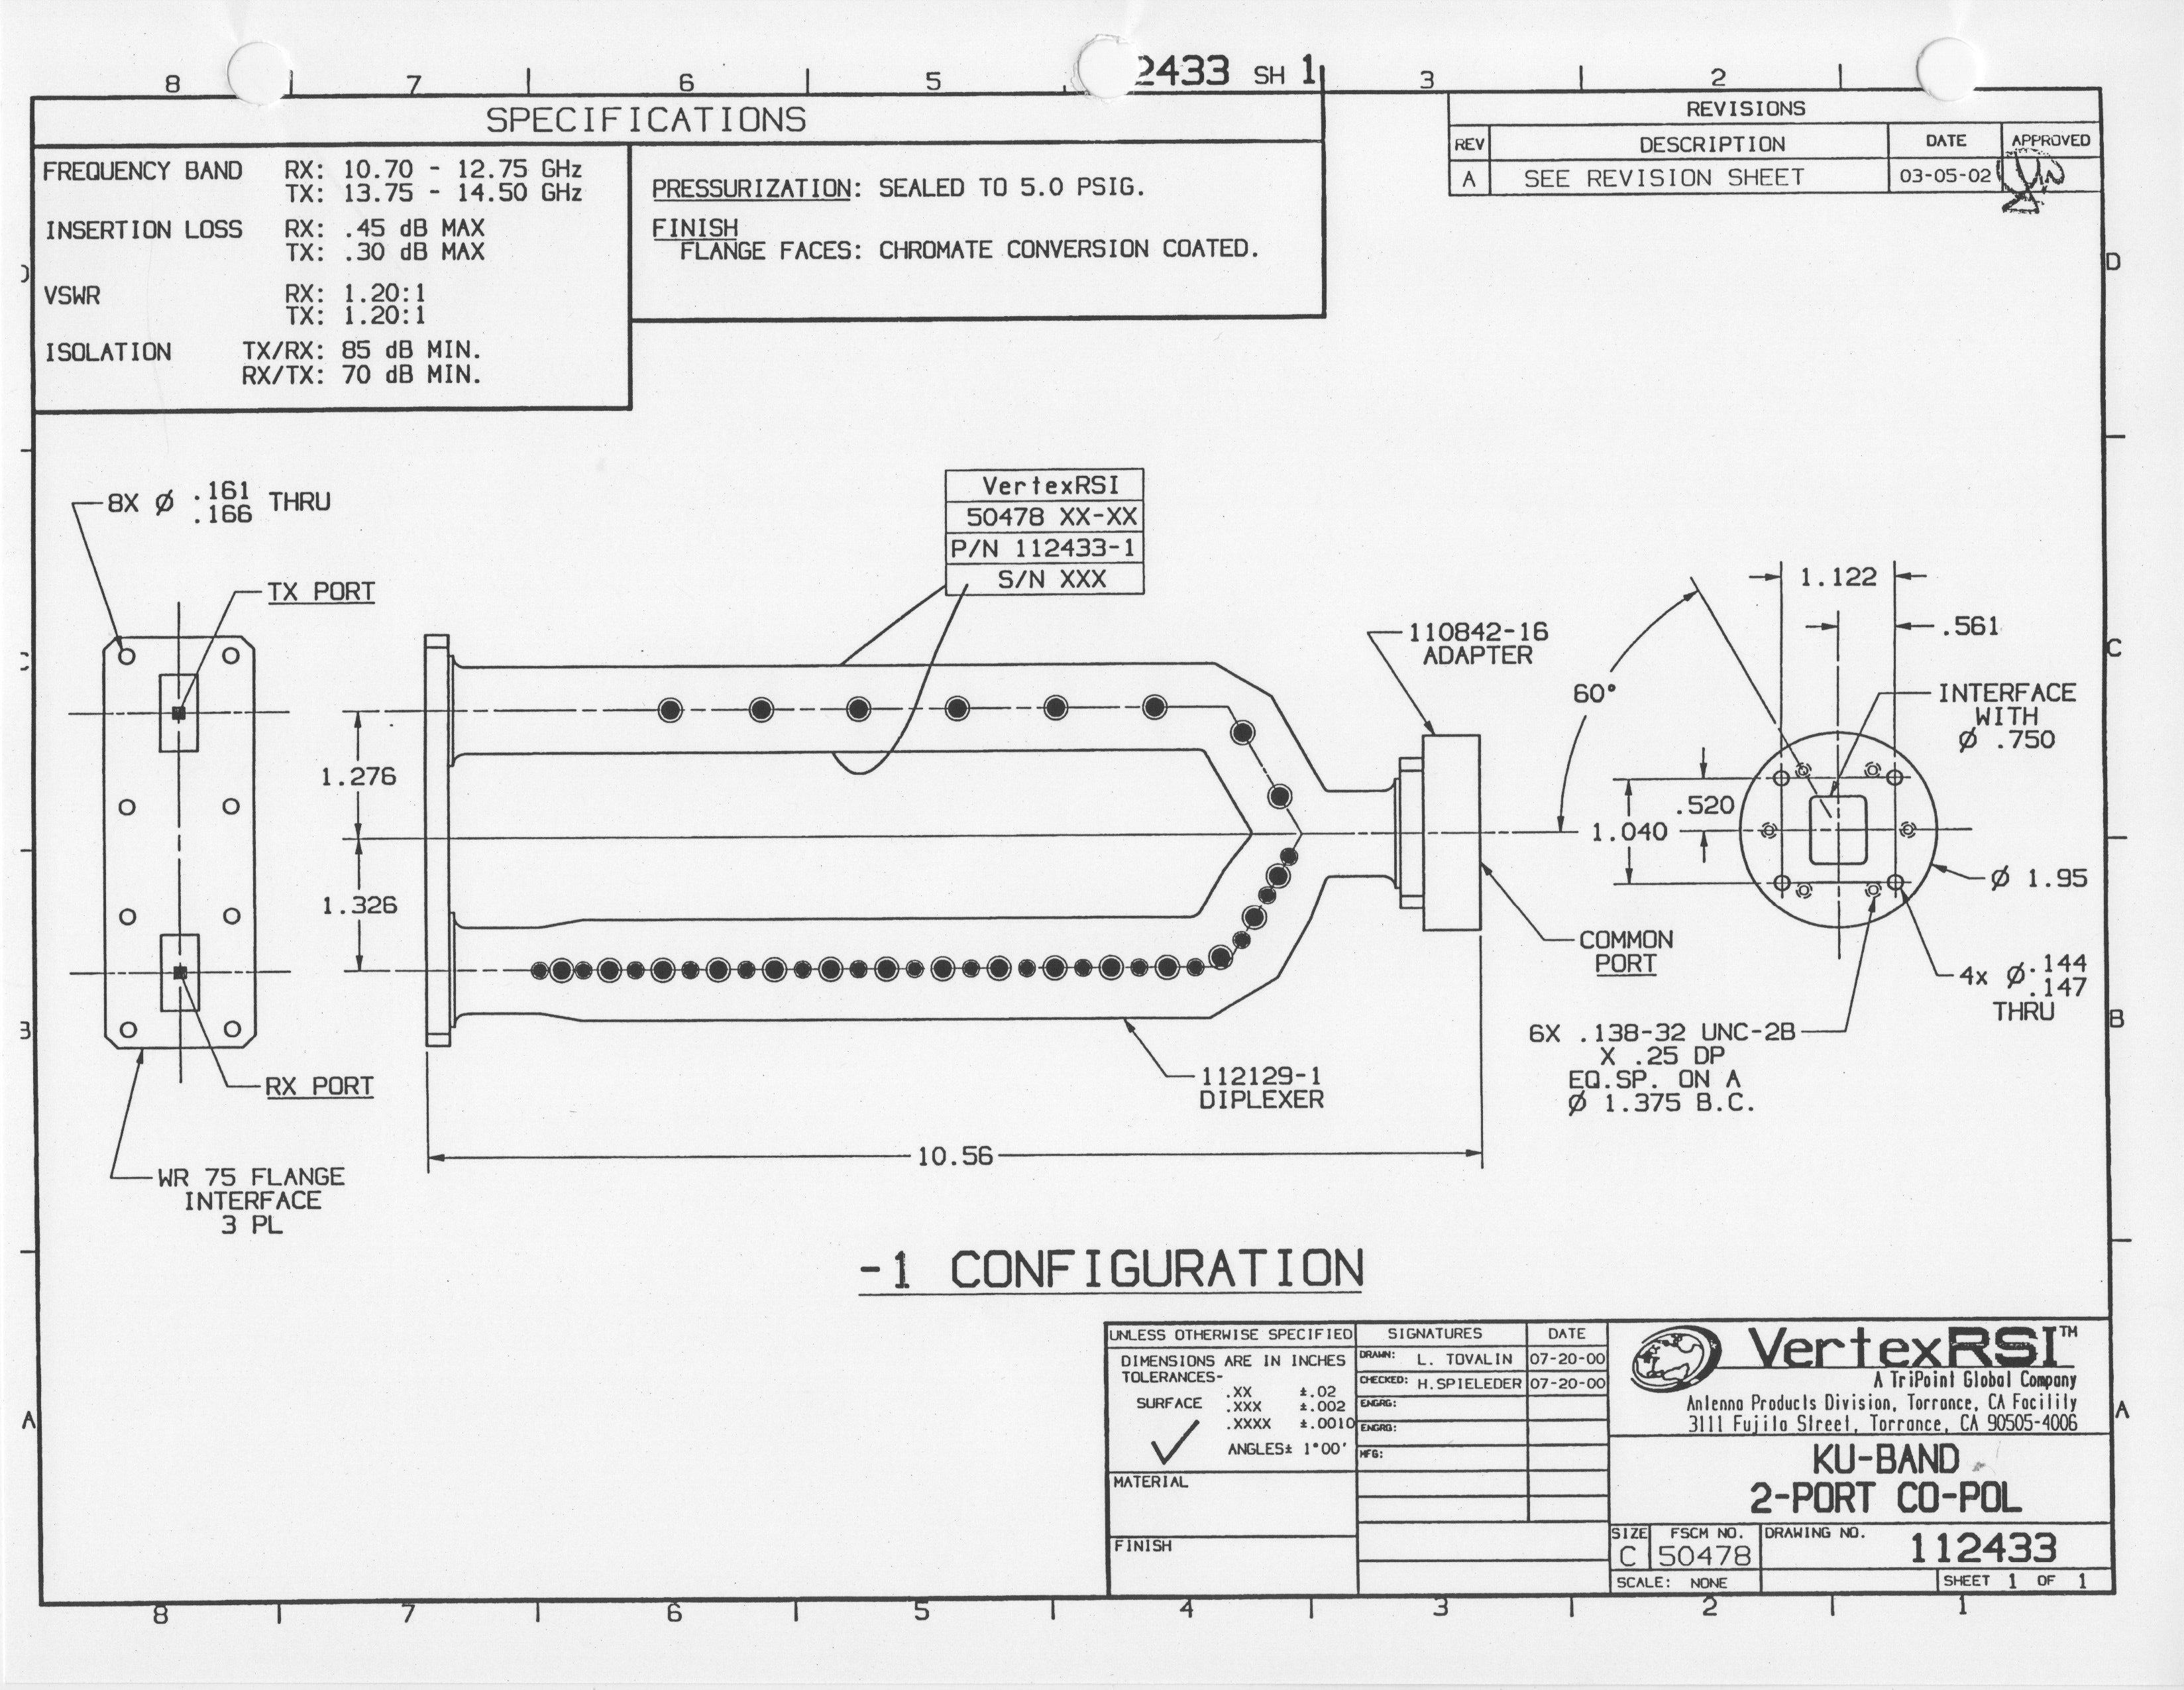 ds-vertex-112433-diplexer Whelen M Wiring Diagram on whelen lightbar wiring-diagram, whelen edge 9004 wiring-diagram, whelen ups 64lx wiring-diagram, whelen 295hfsa1 wiring-diagram, whelen lfl liberty wiring-diagram, genie garage door opener wiring-diagram, pccs9rw whelen wiring-diagram, whelen siren wiring-diagram,